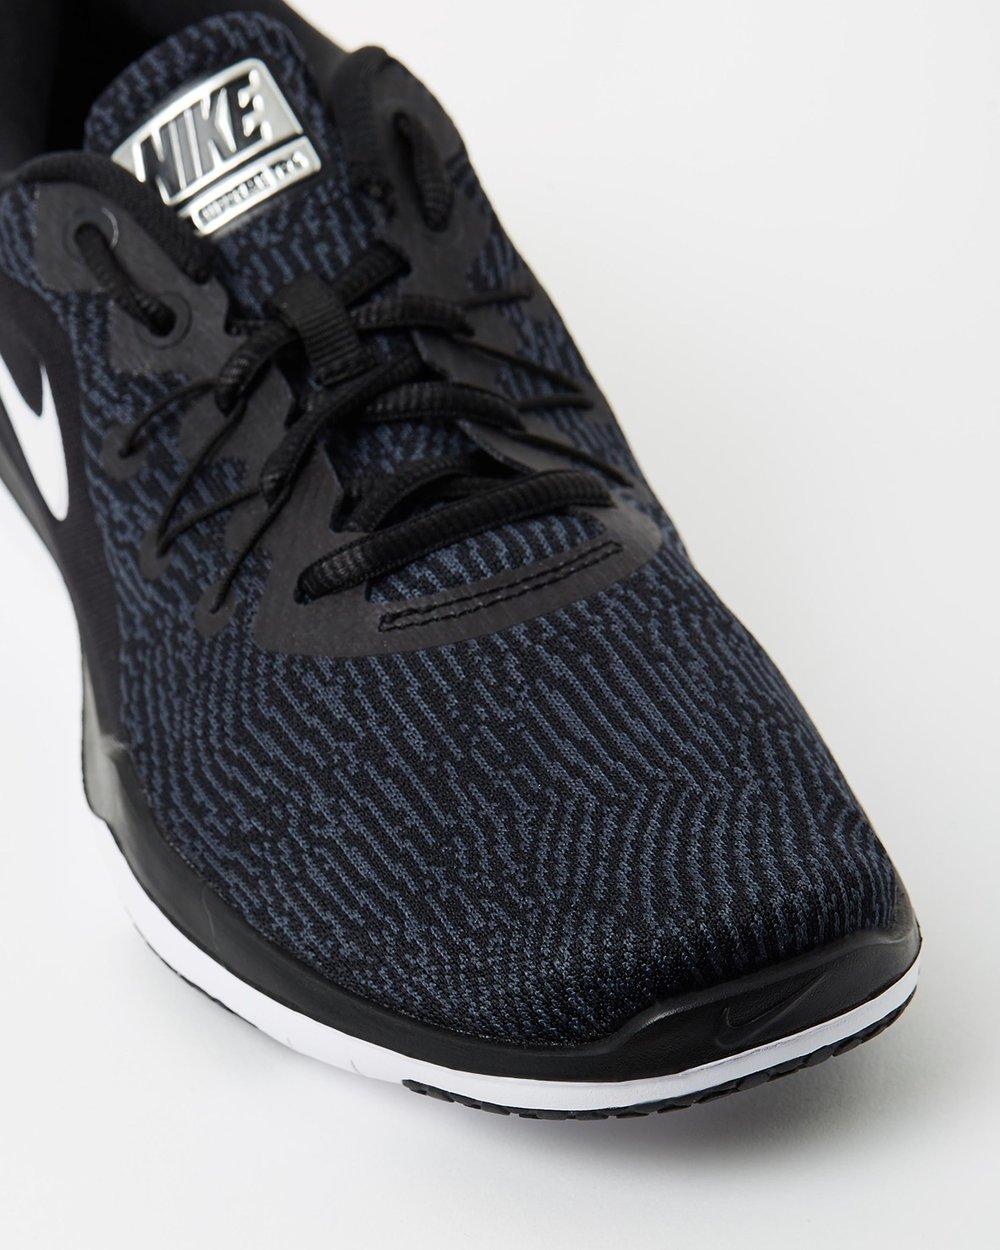 fec0a42eeeb84 Flex Supreme TR 6 Training Shoes - Women s by Nike Online